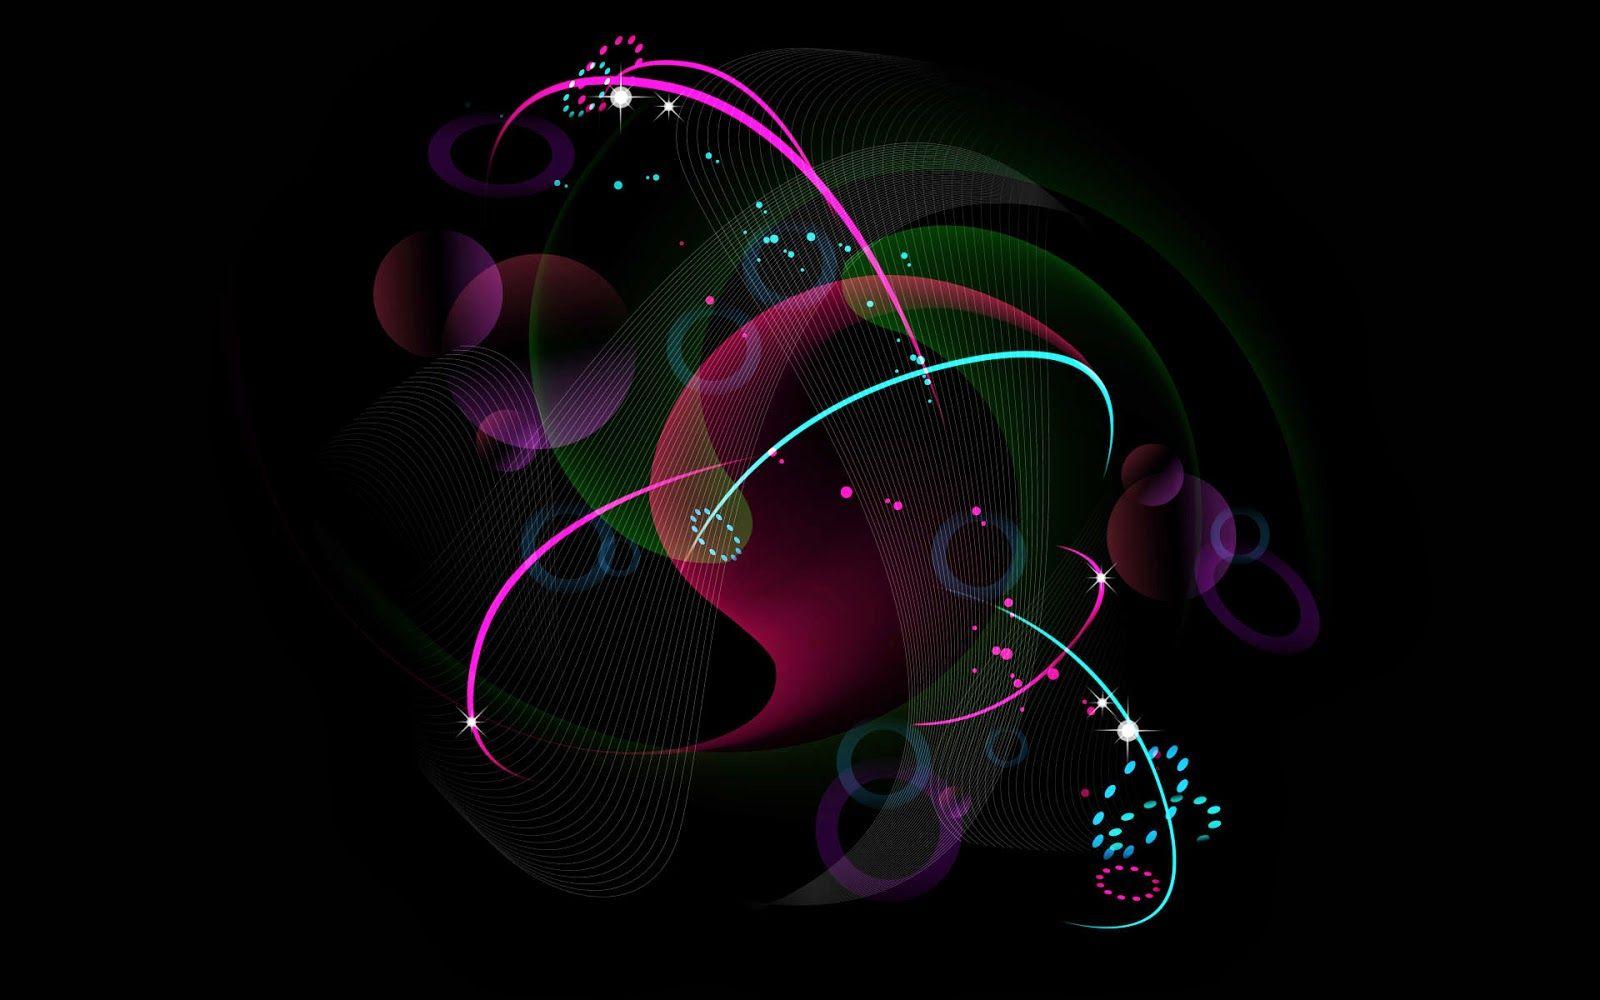 fondo de pantalla abstracto simbolo chat imagenes